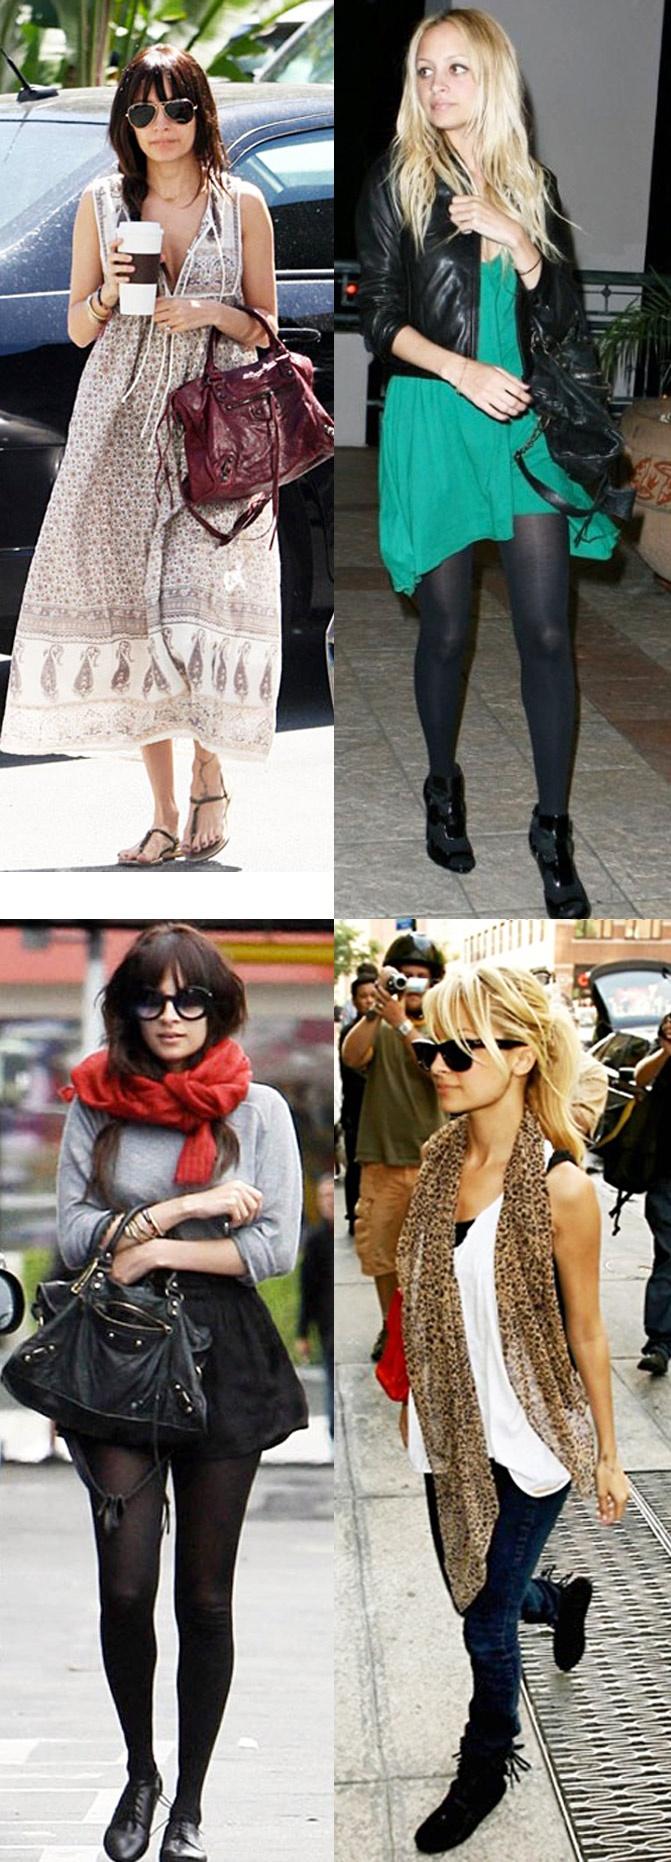 Nicole Richie Style, Fashion